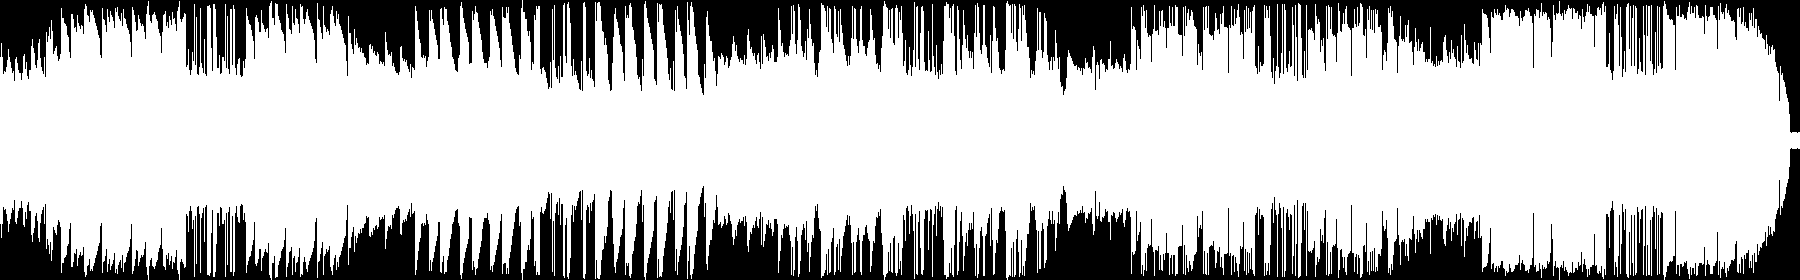 Black Rose audio waveform